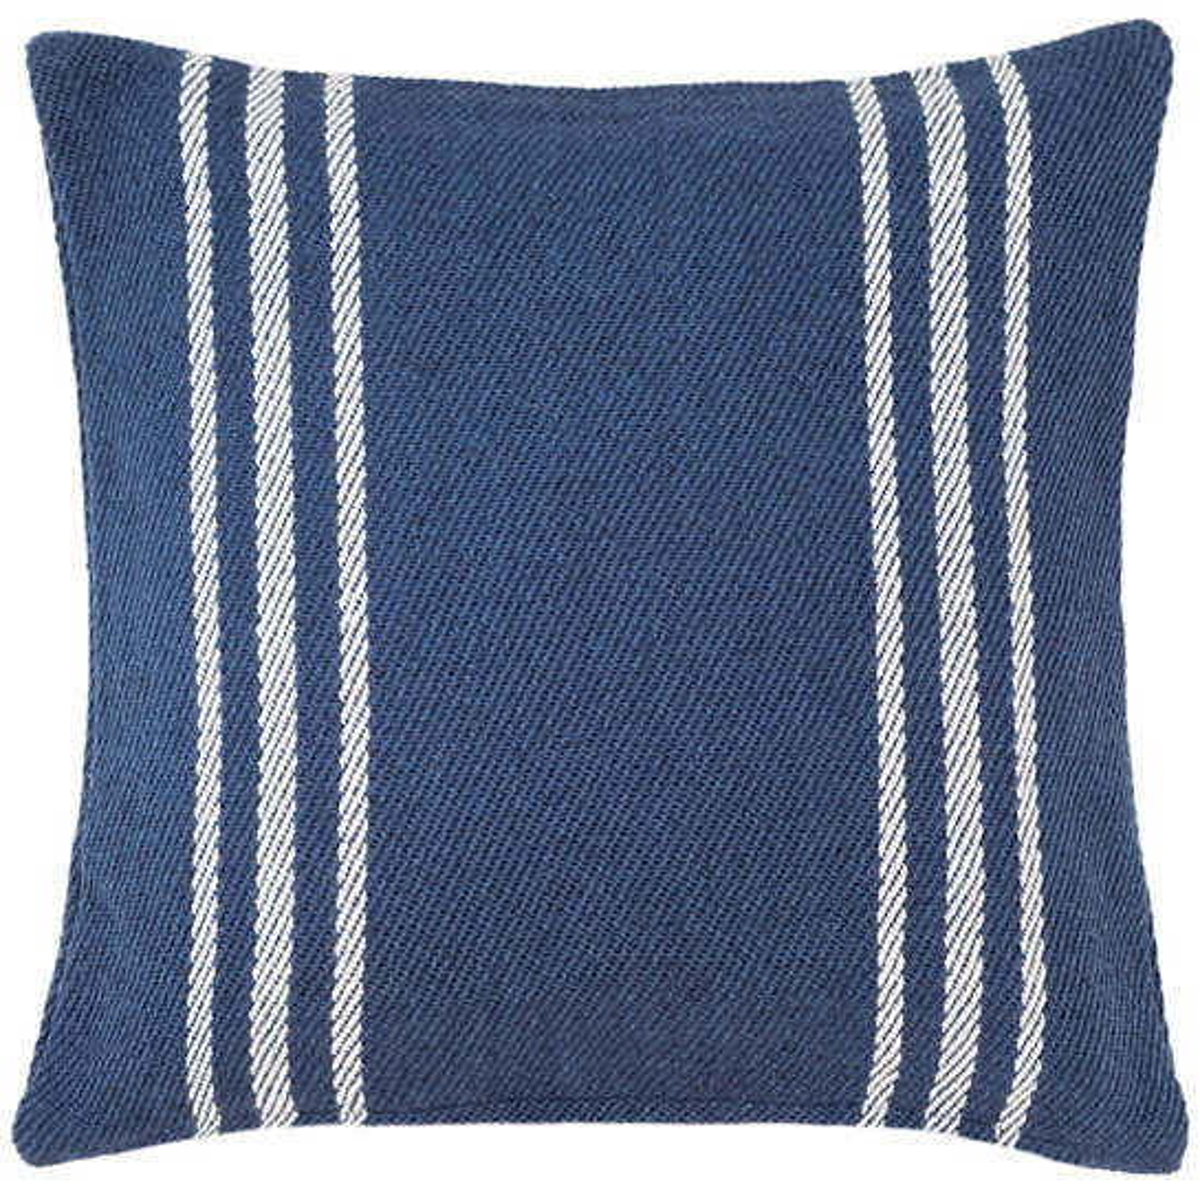 Lexington Navy/White Indoor/Outdoor Pillow